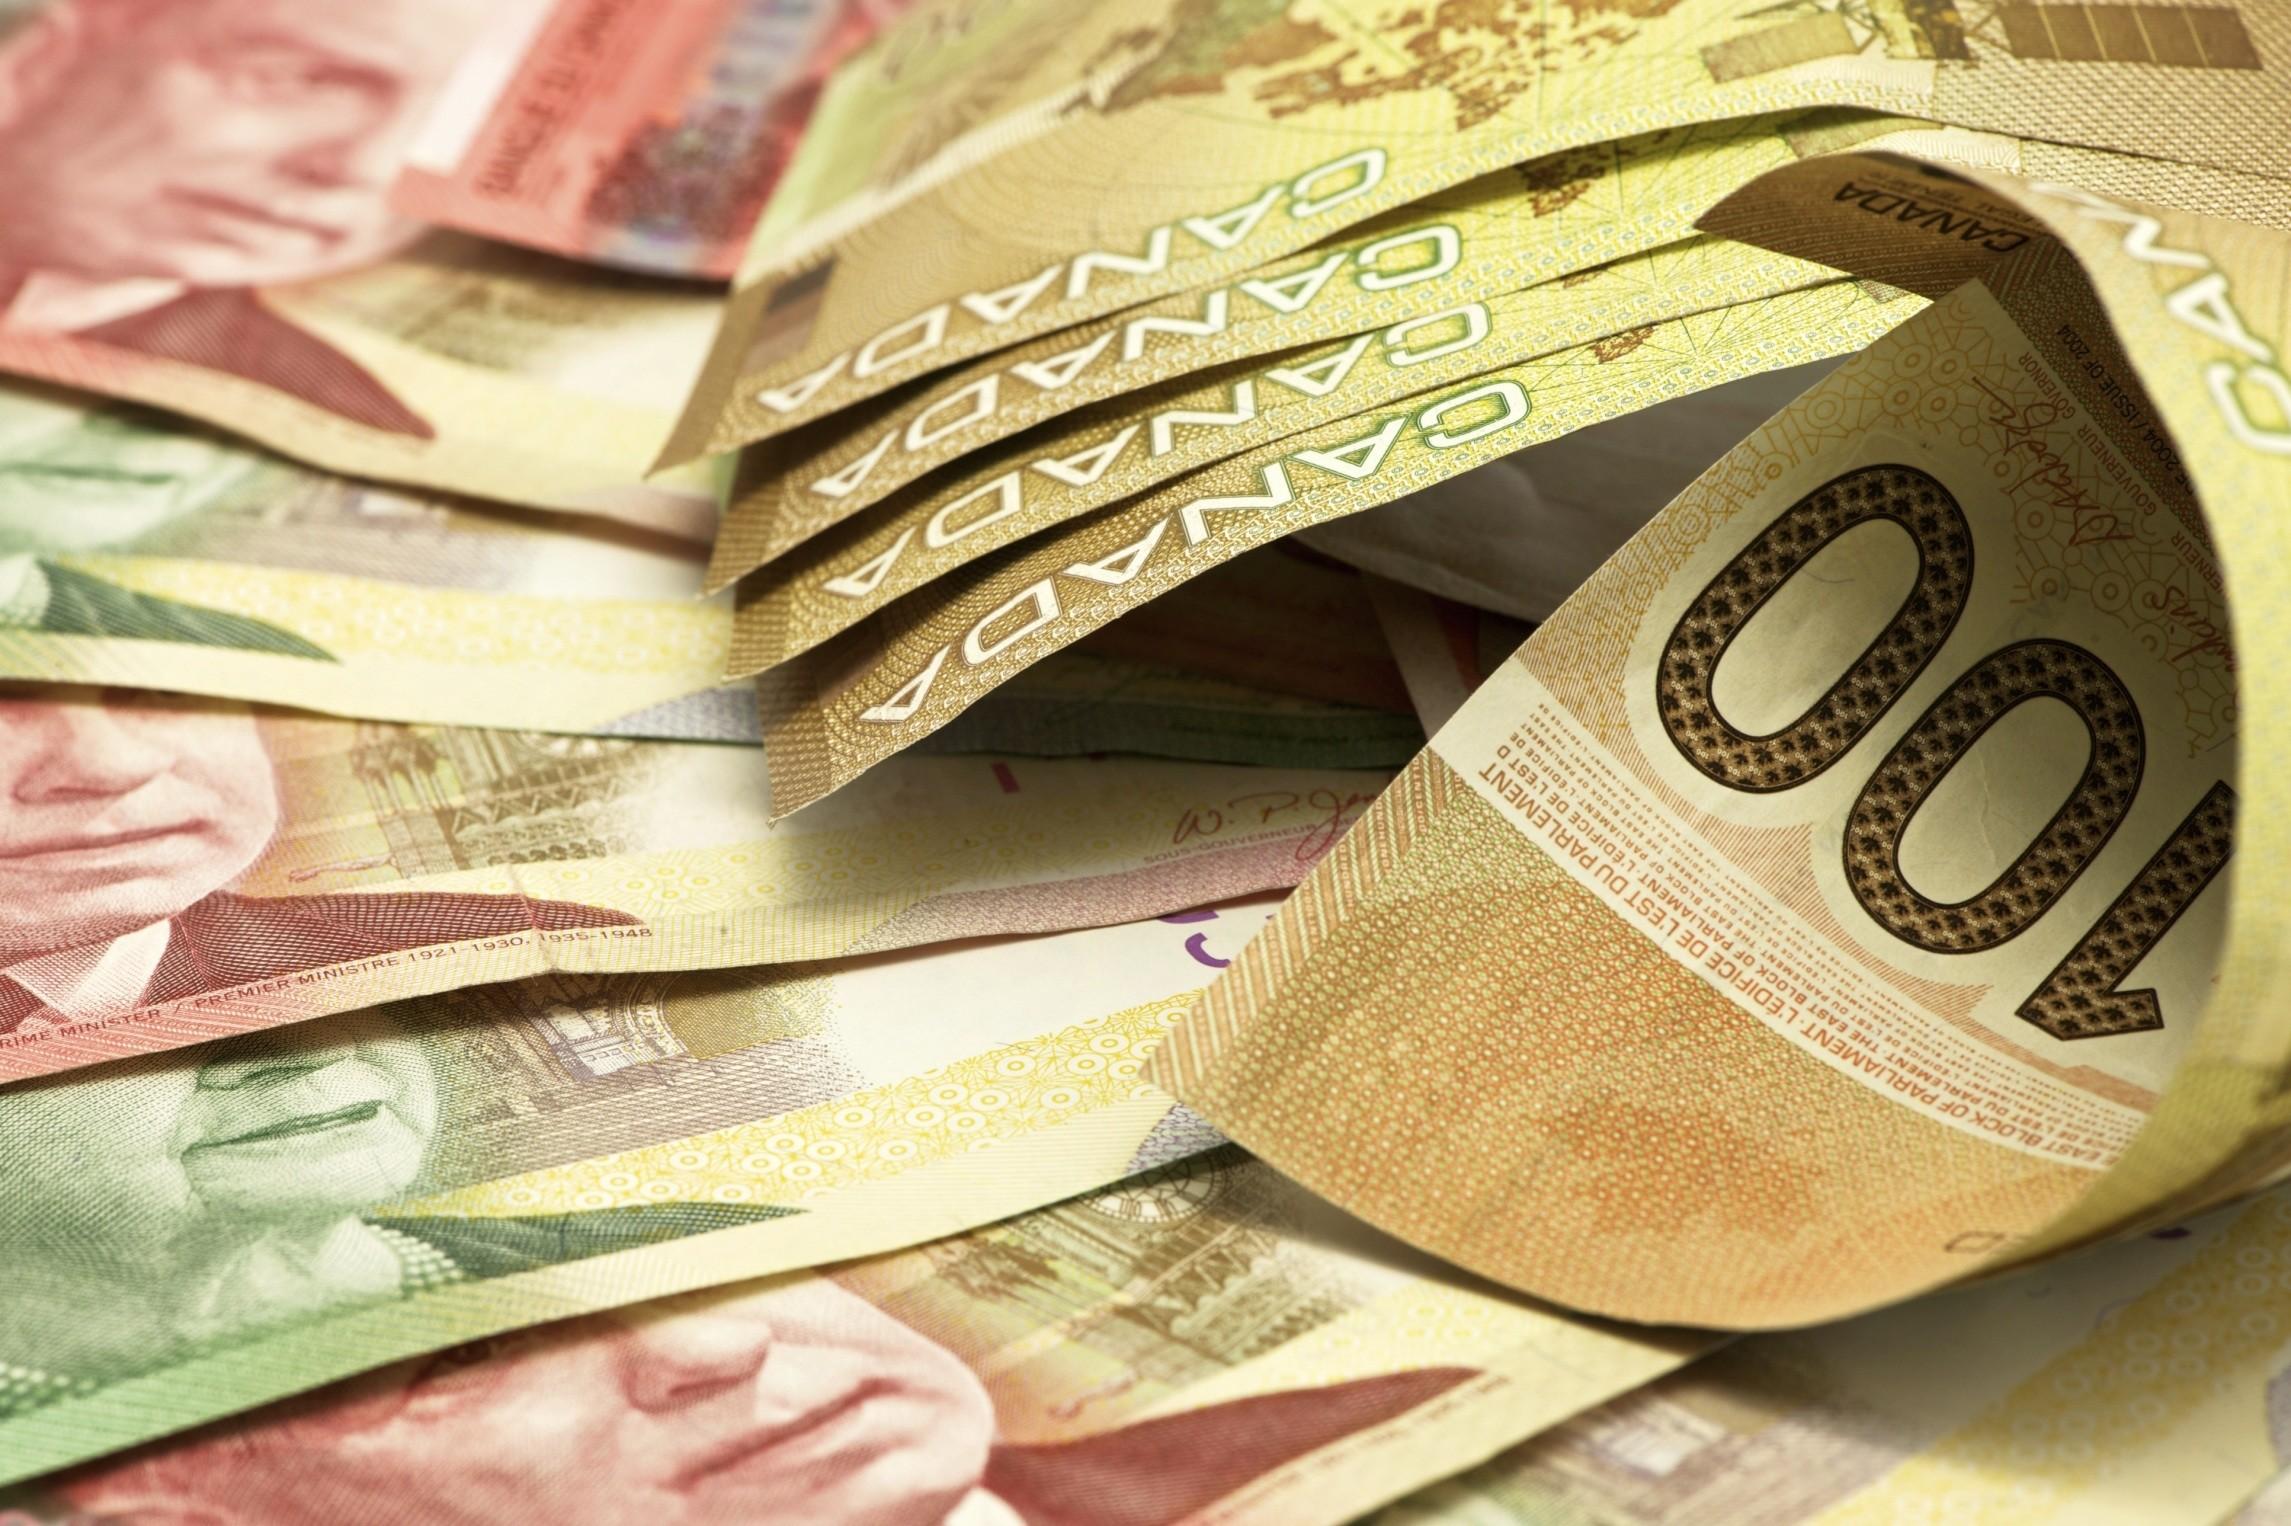 Canadian Money Banknotes Wallpapers | MoneyWallpapers.com